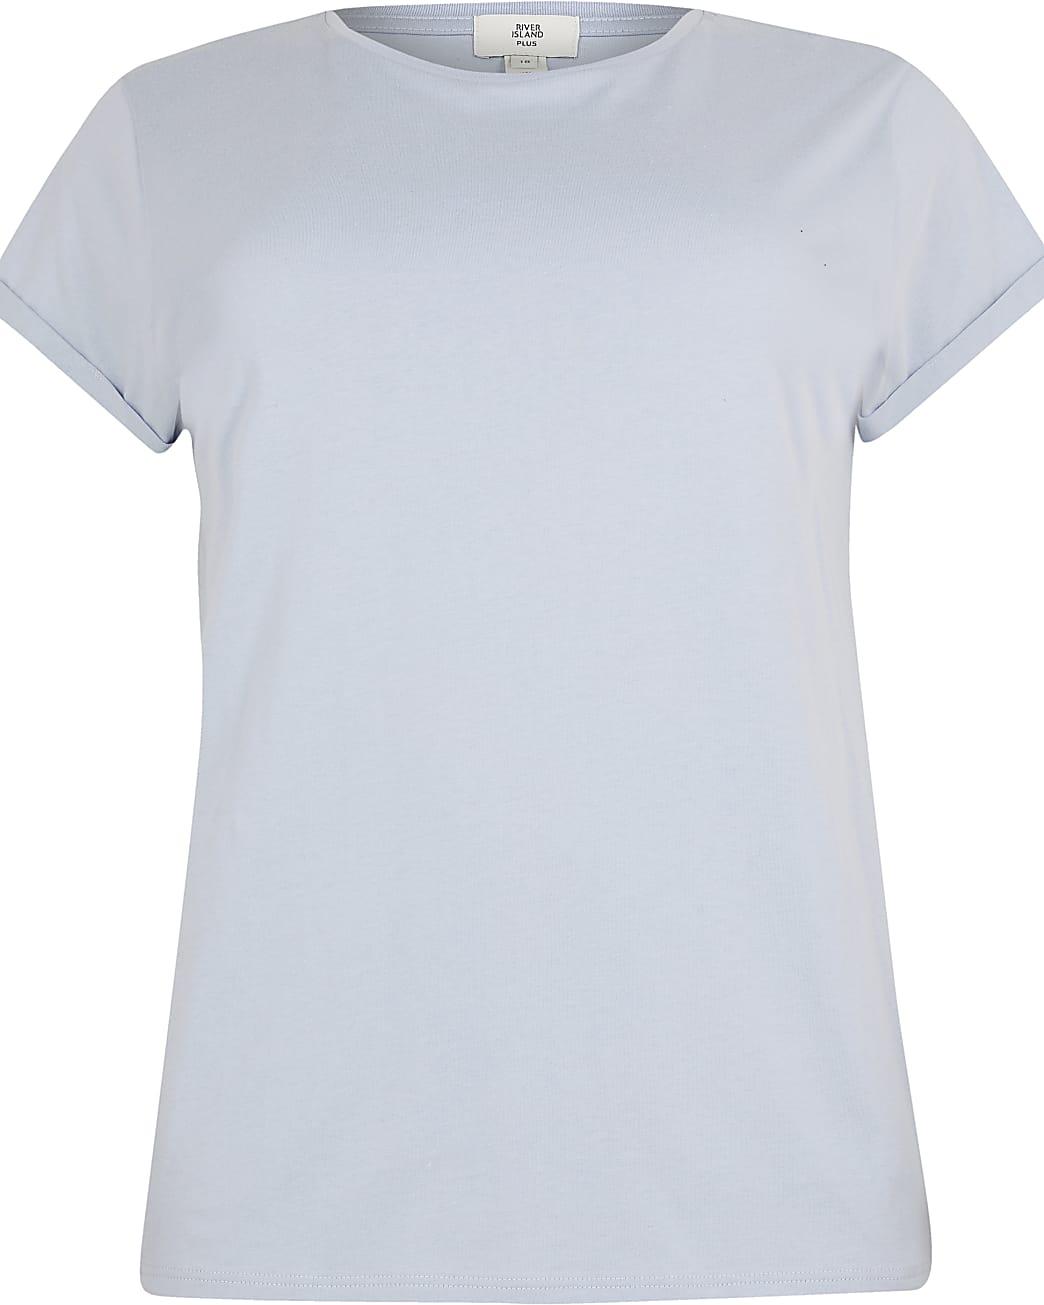 Plus blue turn up short sleeve t-shirt